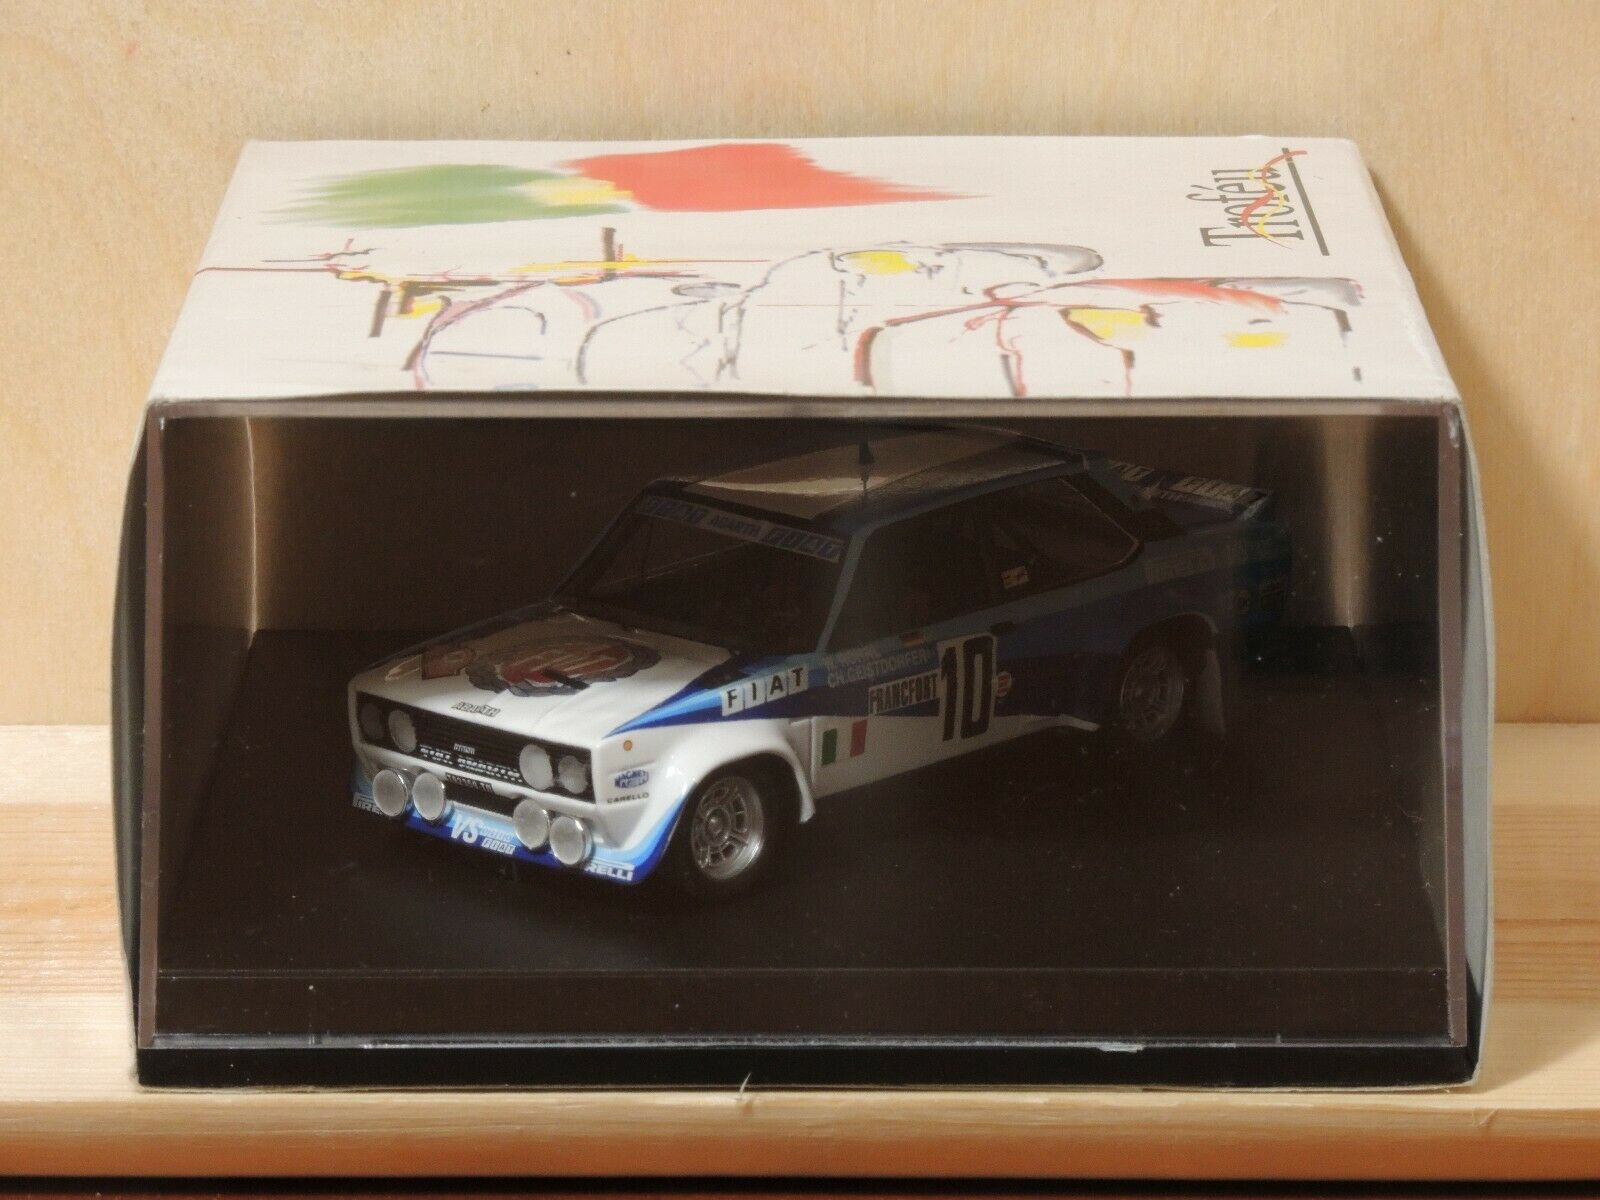 Trofeu 1407 1  43 Fiat 131 Abbas MonteCyelo 1980 rohrl - geistdorfer